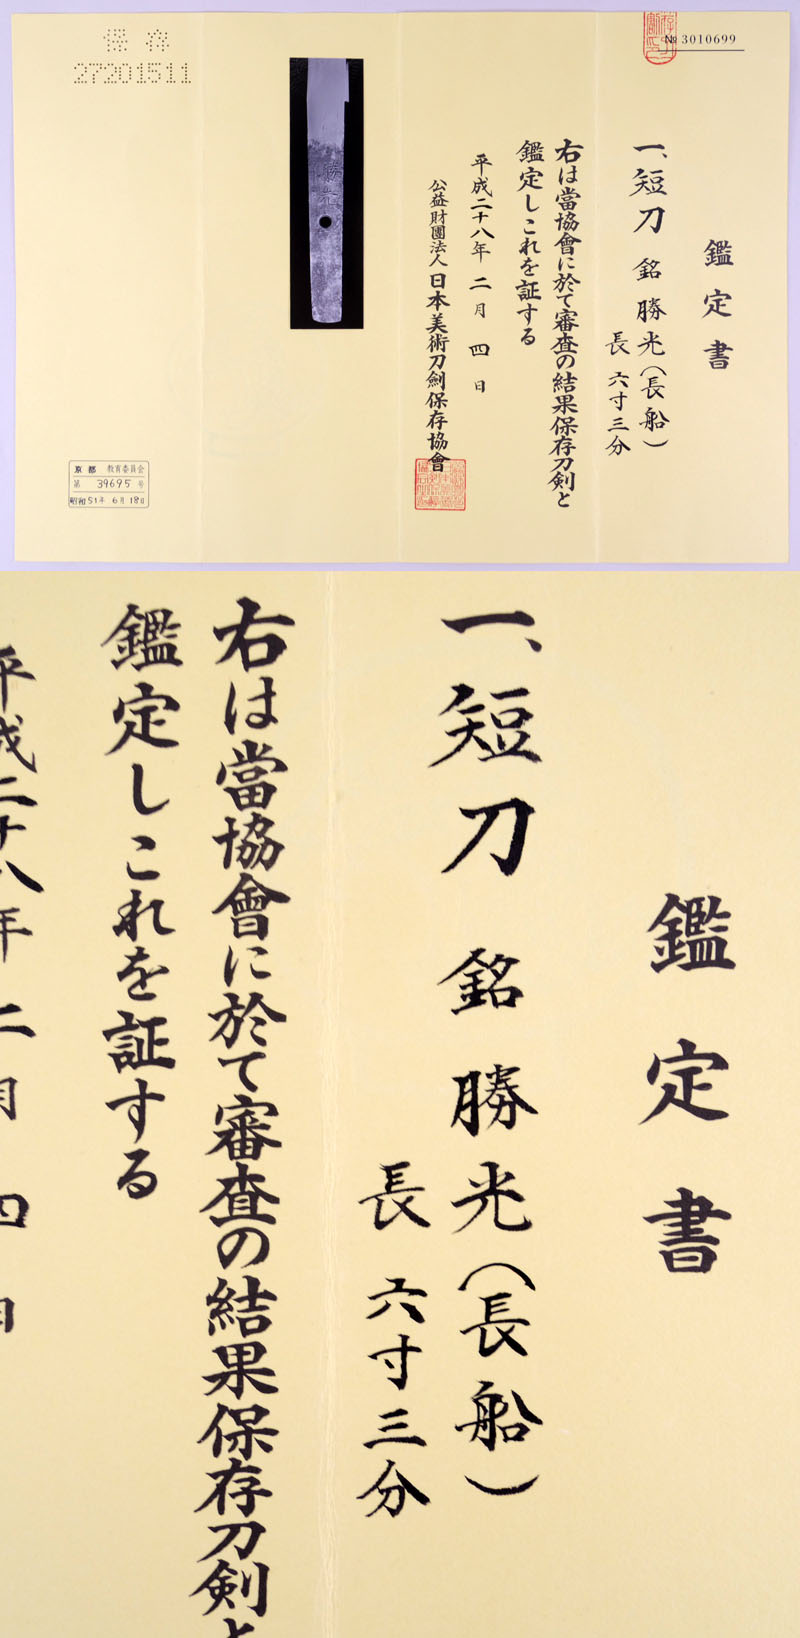 勝光(長船勝光) Picture of Certificate